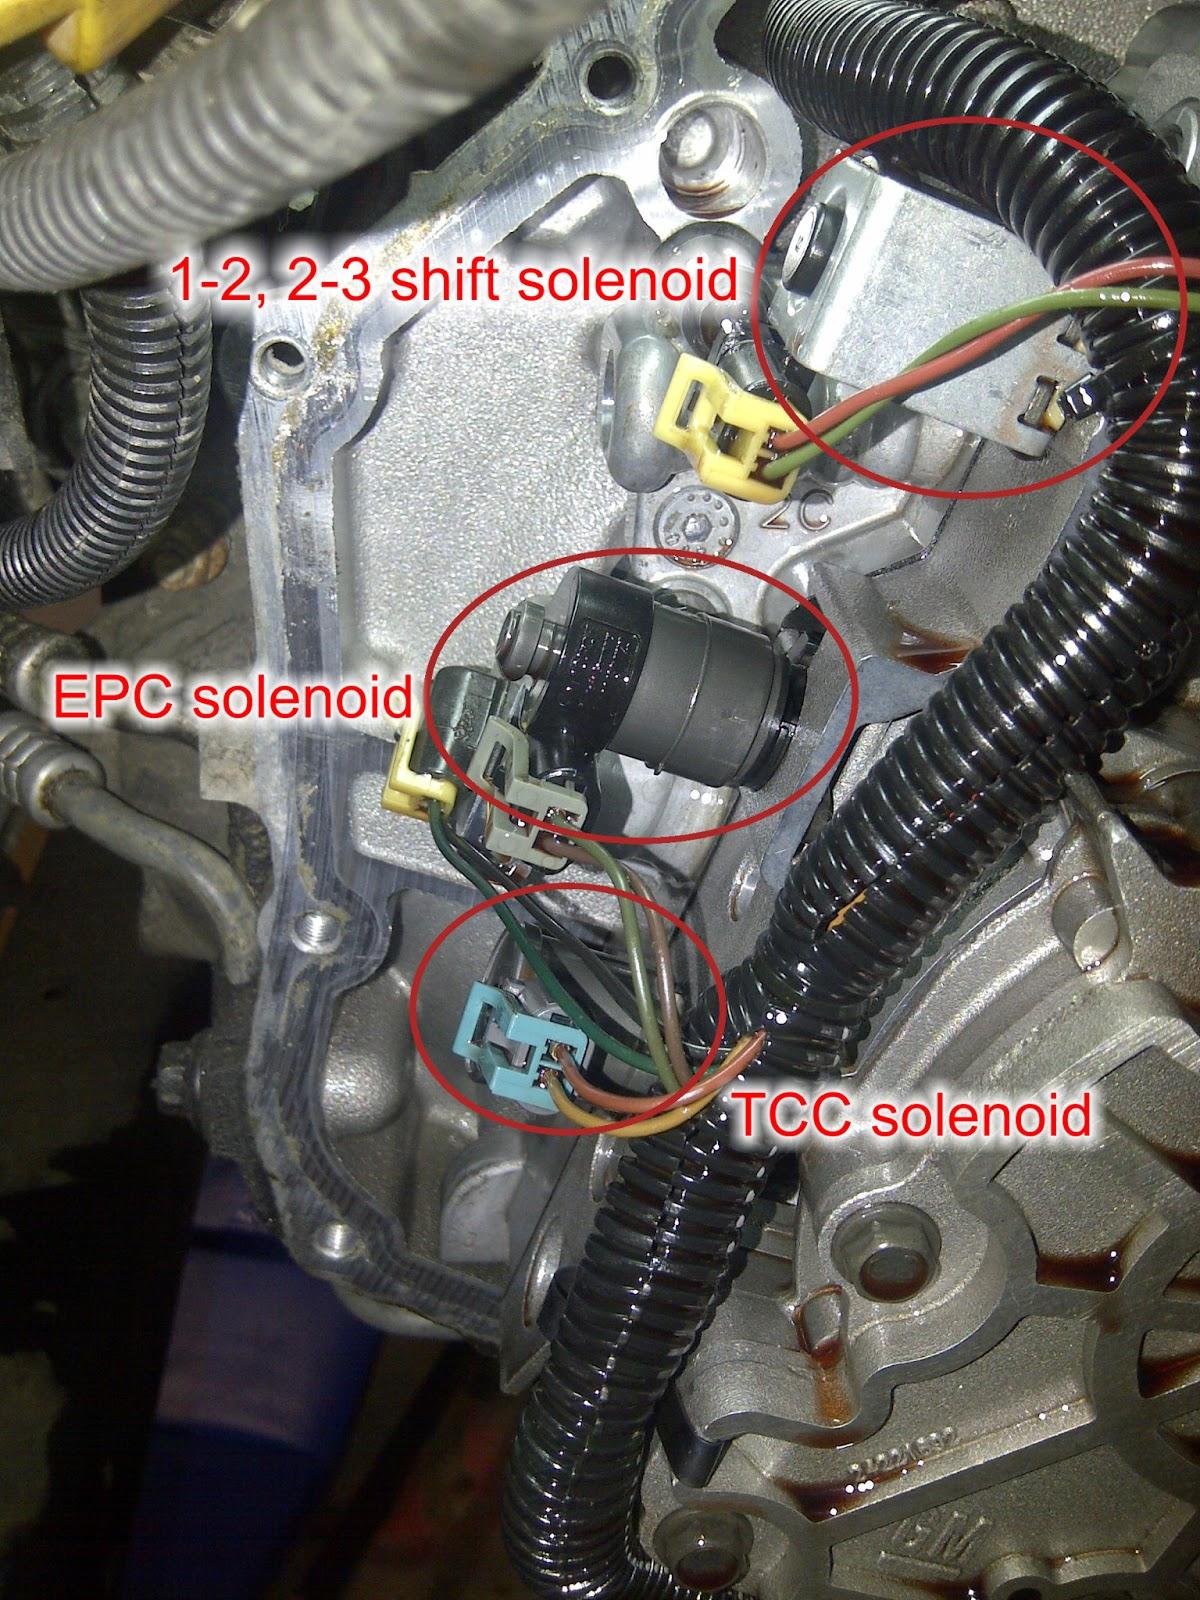 4t65e Tcc Solenoid Location Parts Wiring Diagram Images